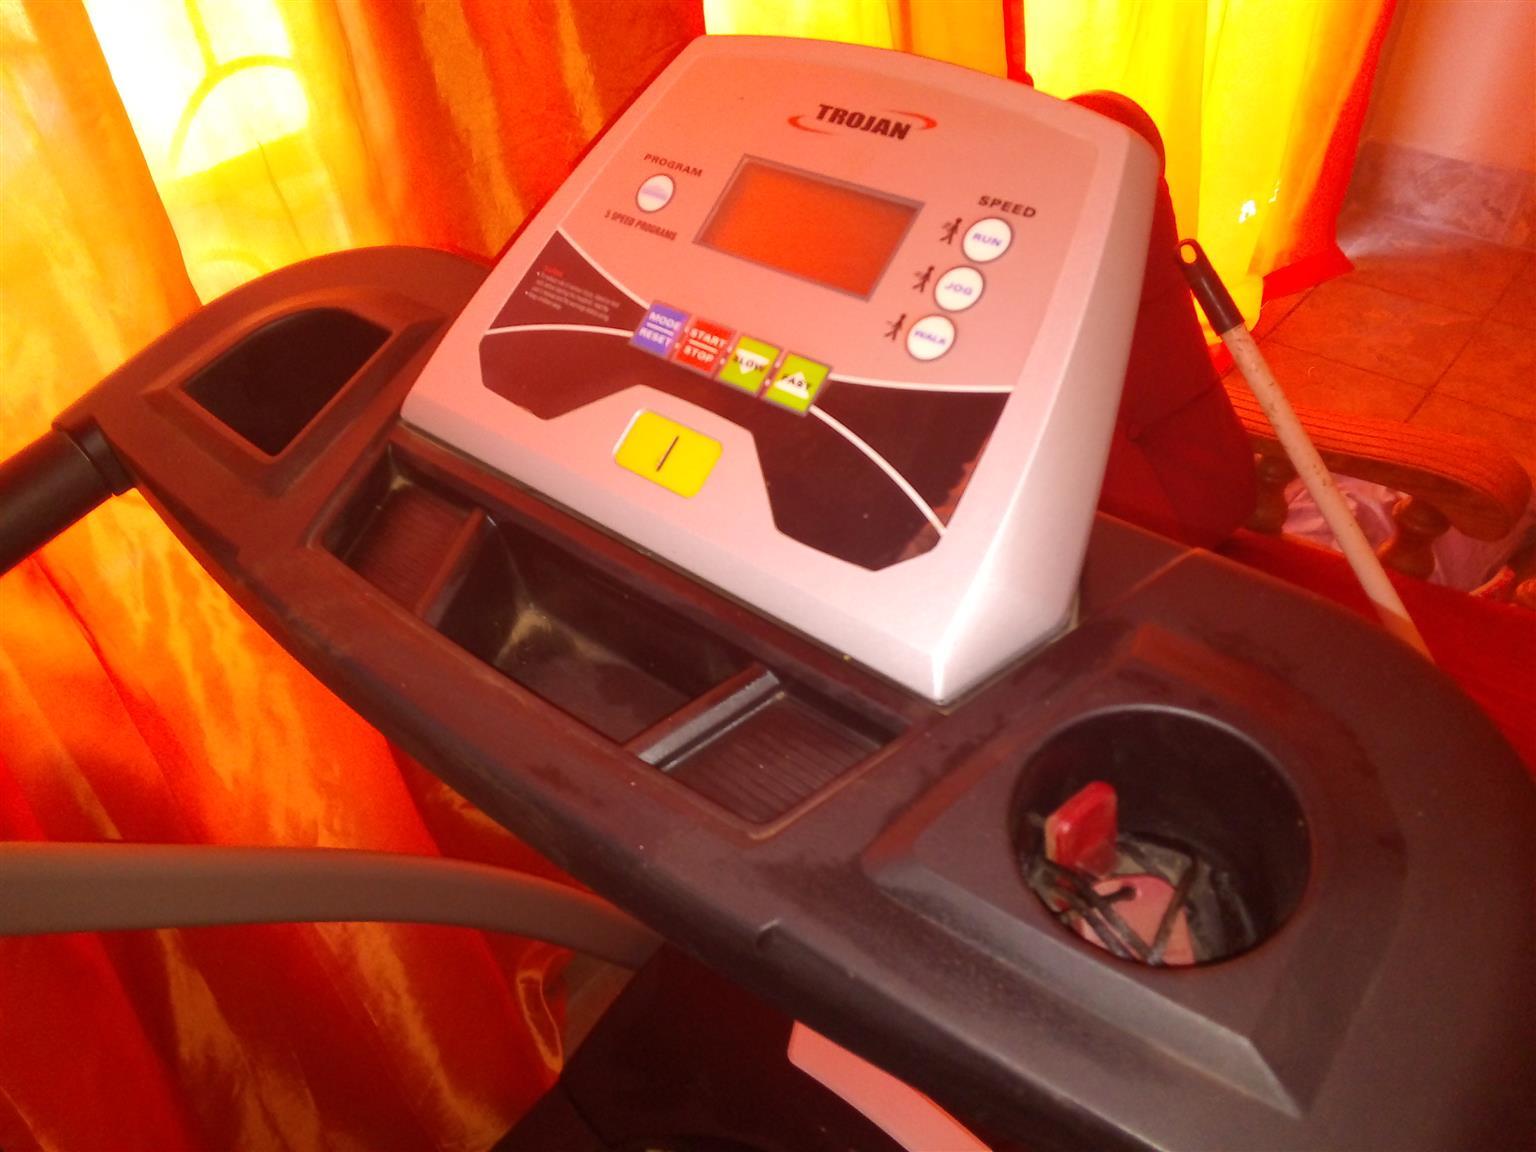 Trojan Marathon 210 Treadmill for sale. R3000 neg